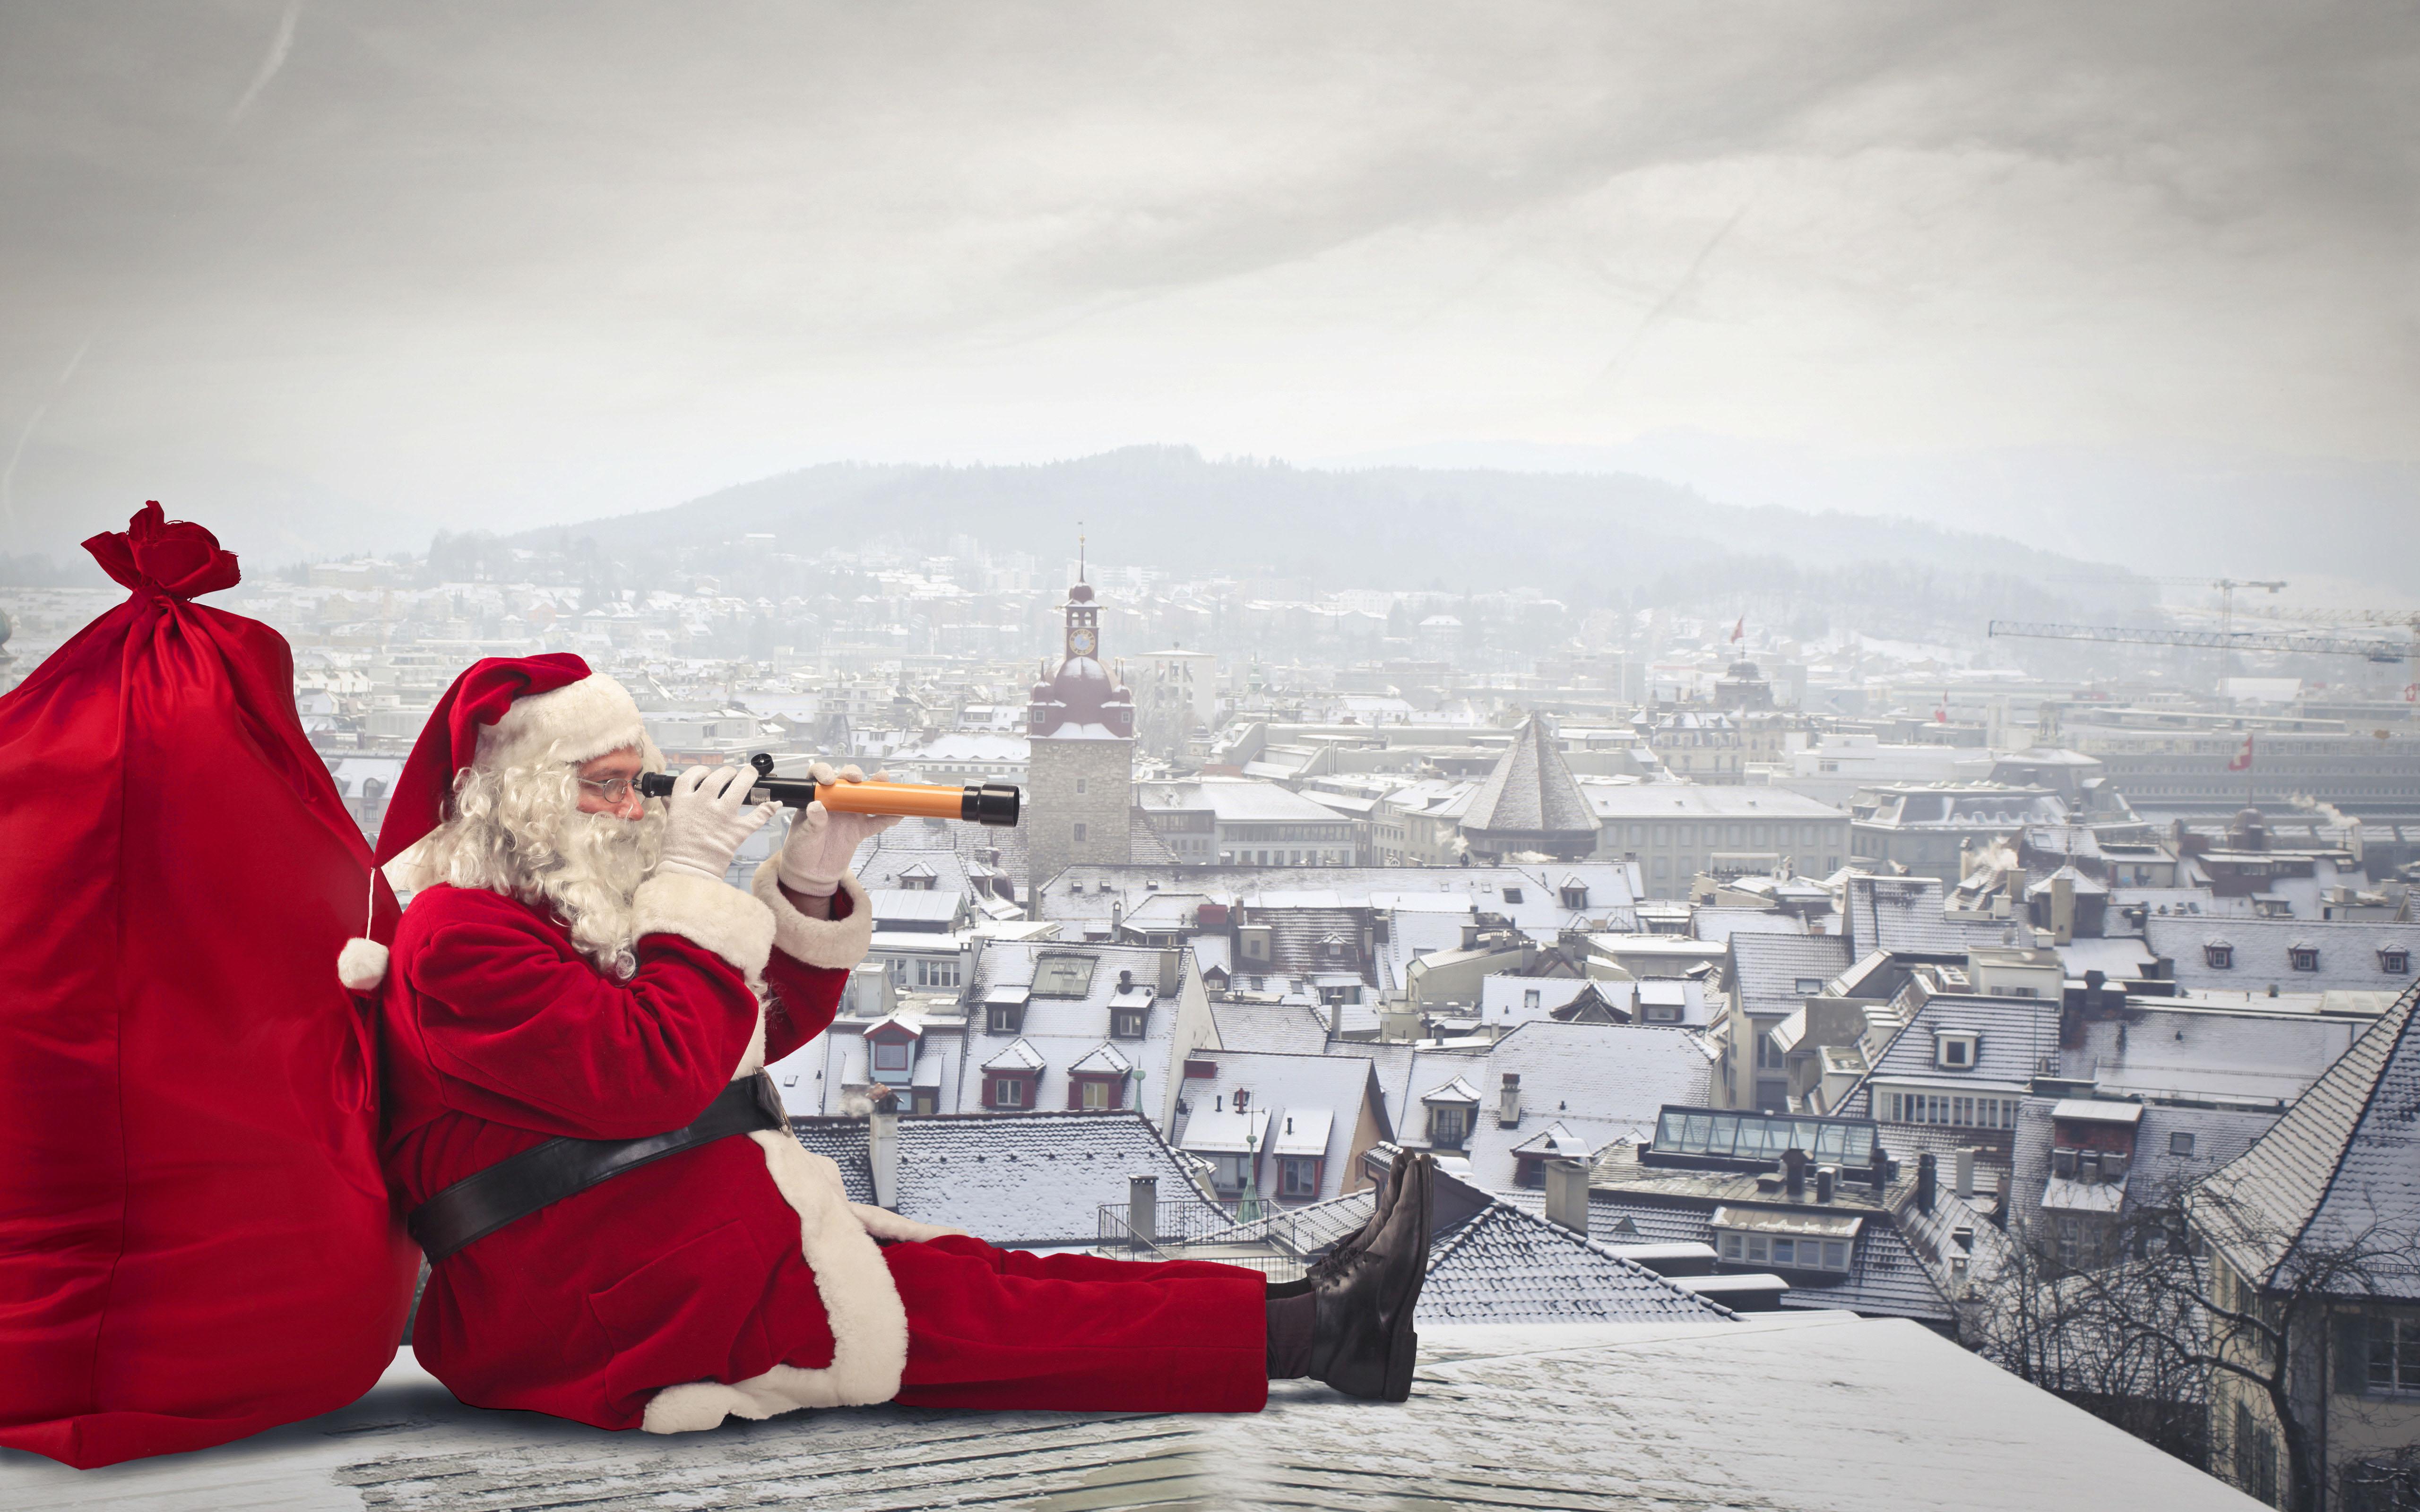 Санта Клаус на крыше дома, новогодние обои на телефон 2020, 5120 на 3200 пикселей